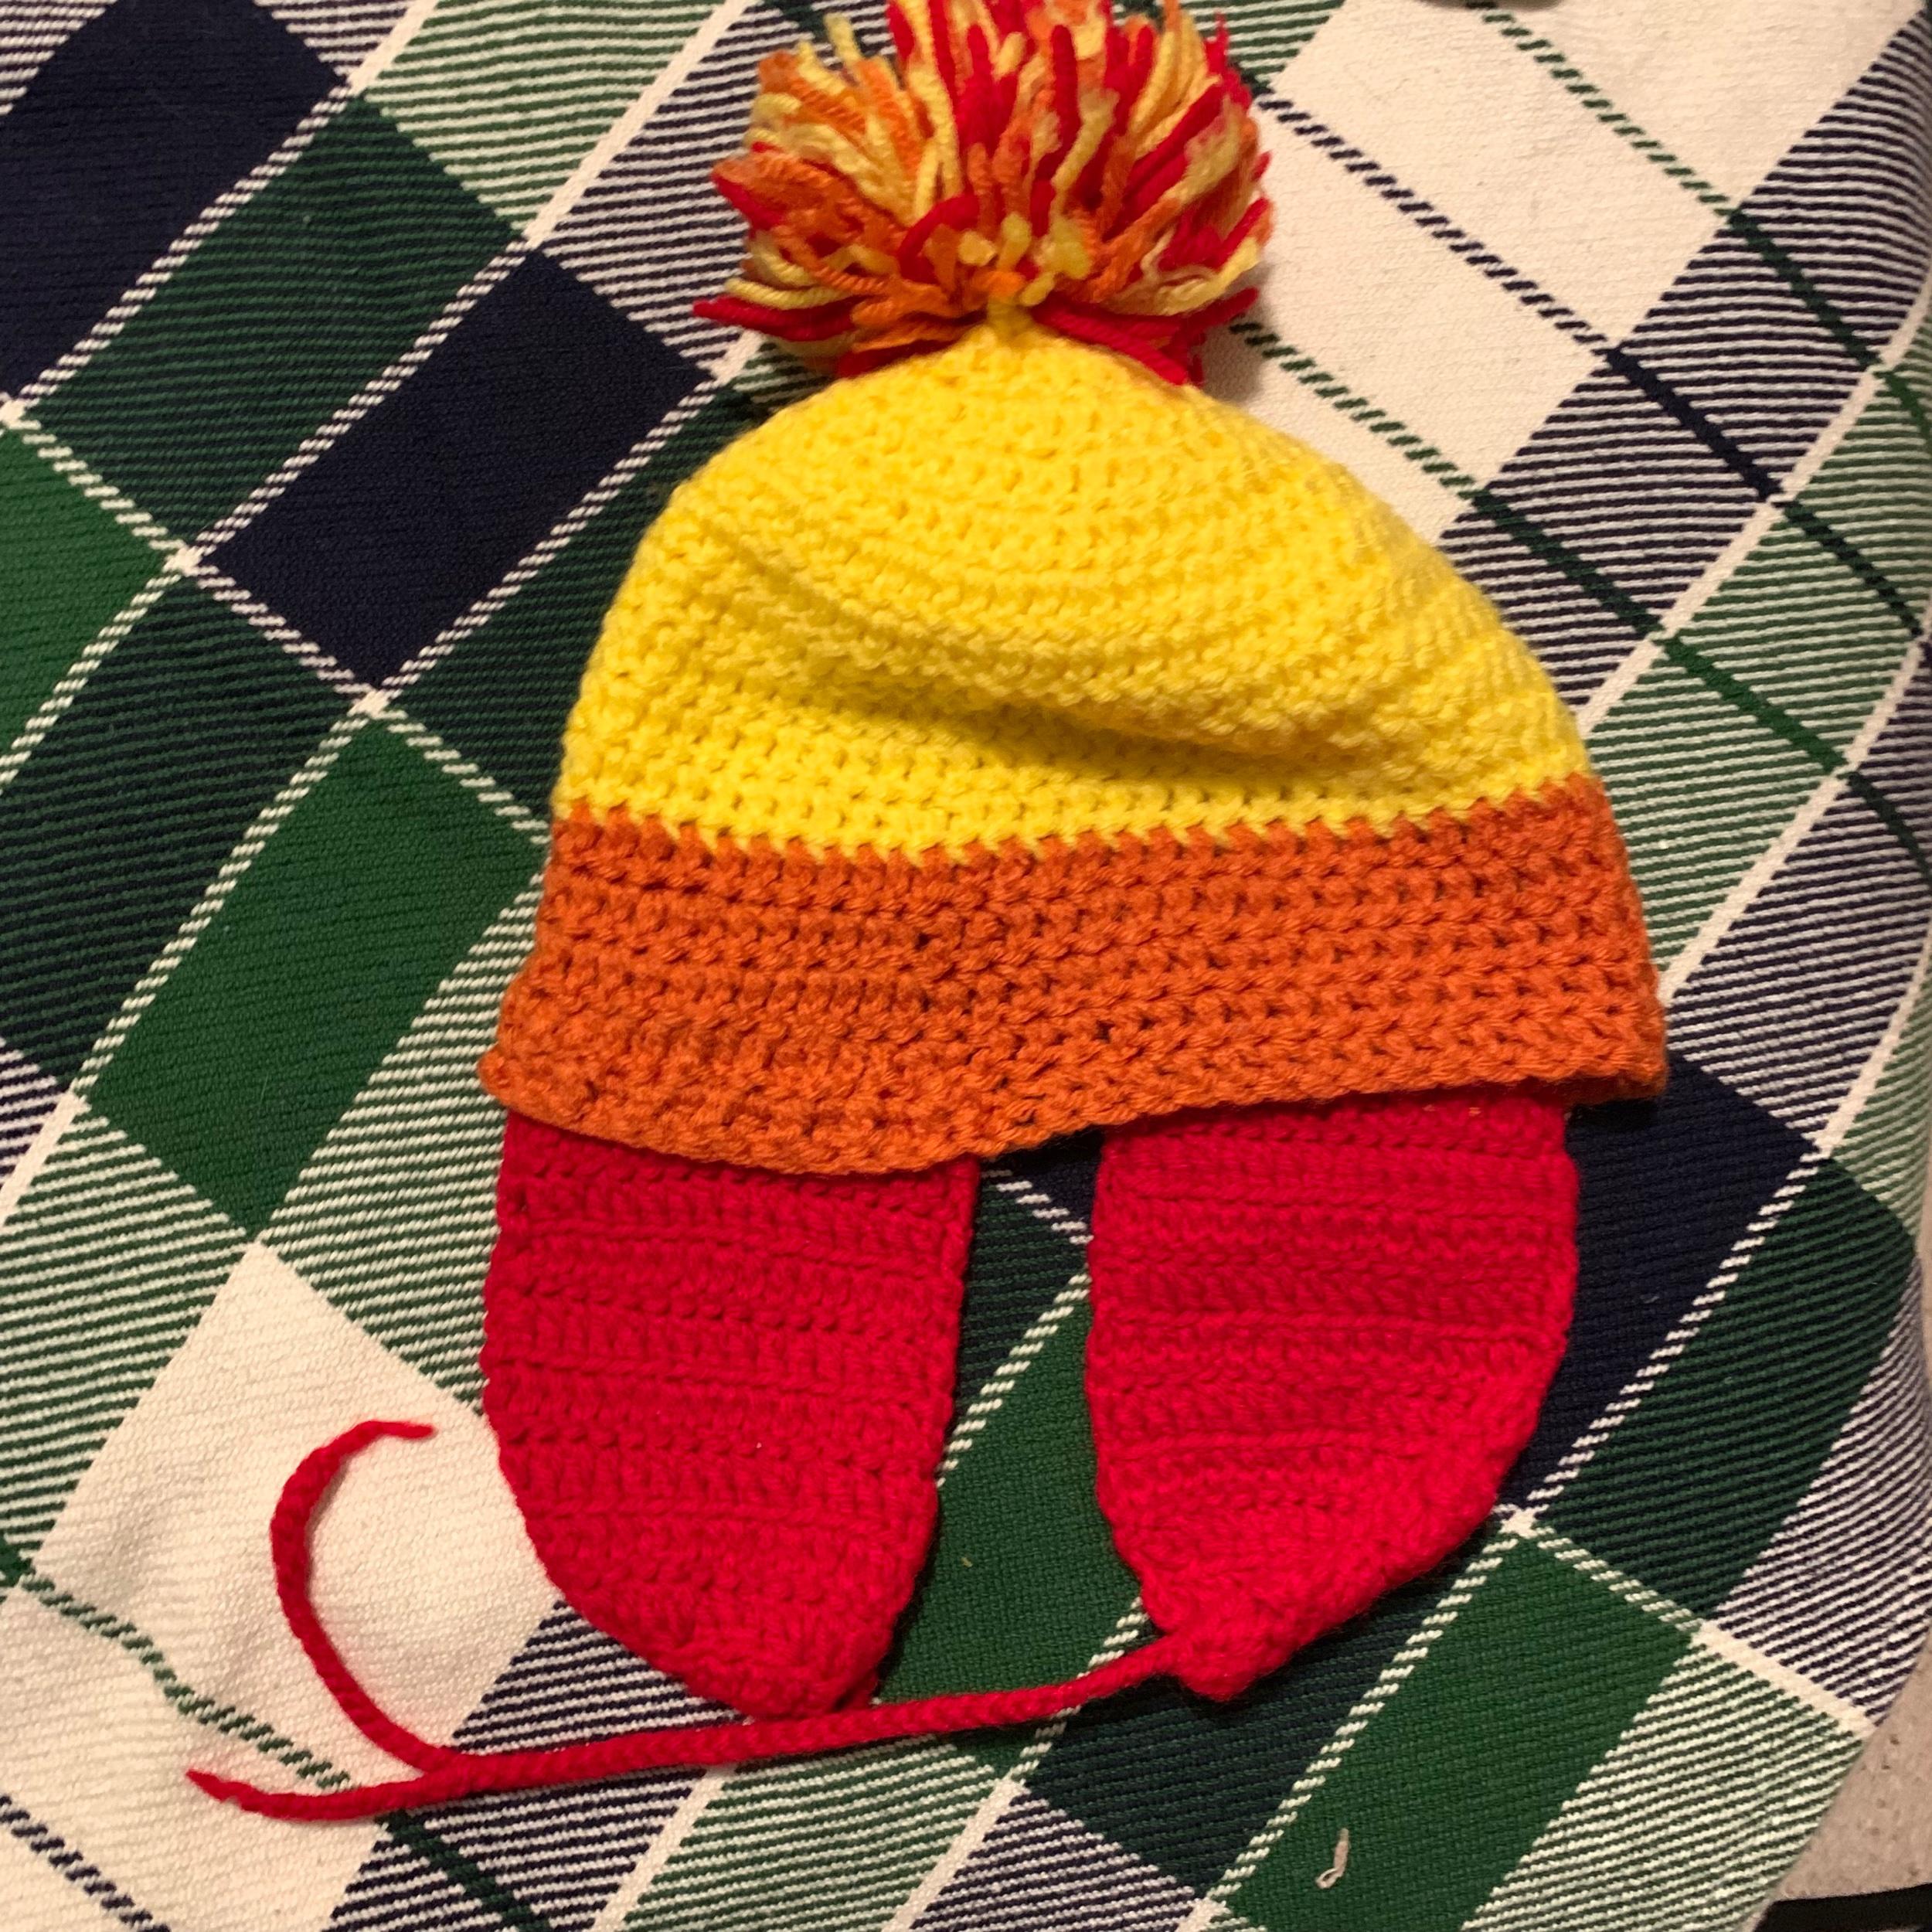 Jayne Cobb hat I crocheted for myself